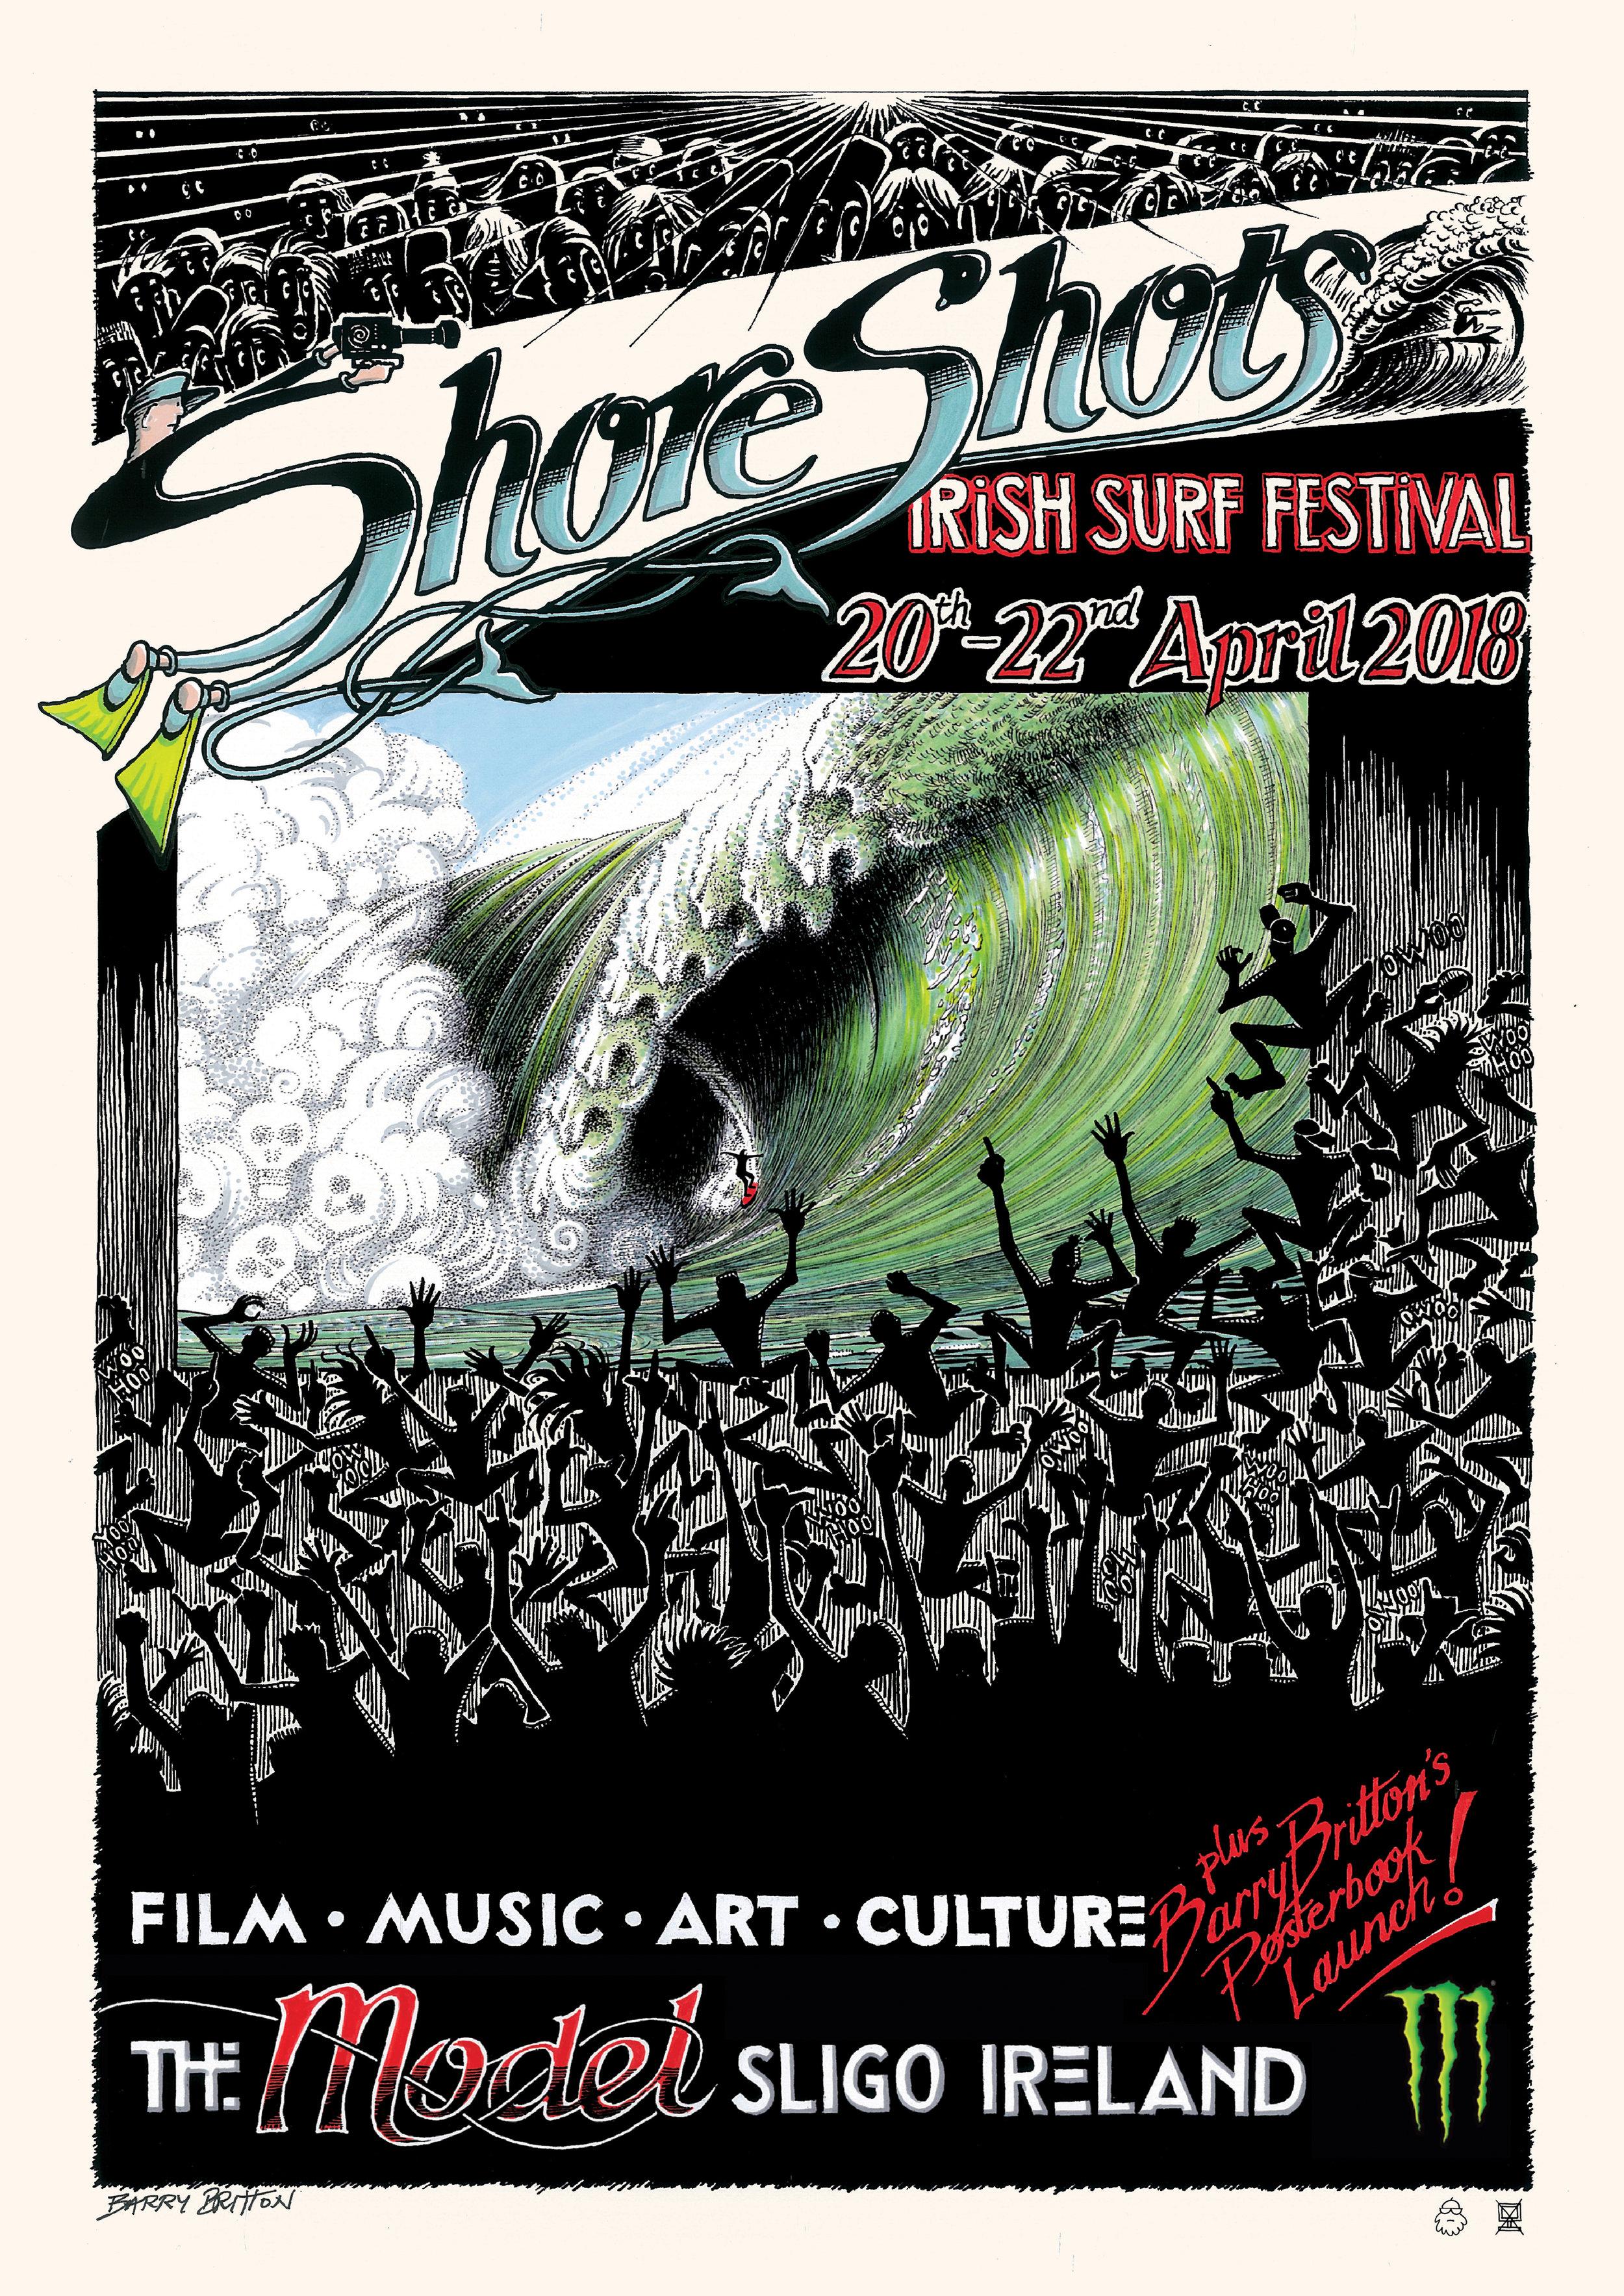 Shore Shots Poster_A3 SIZE.jpg